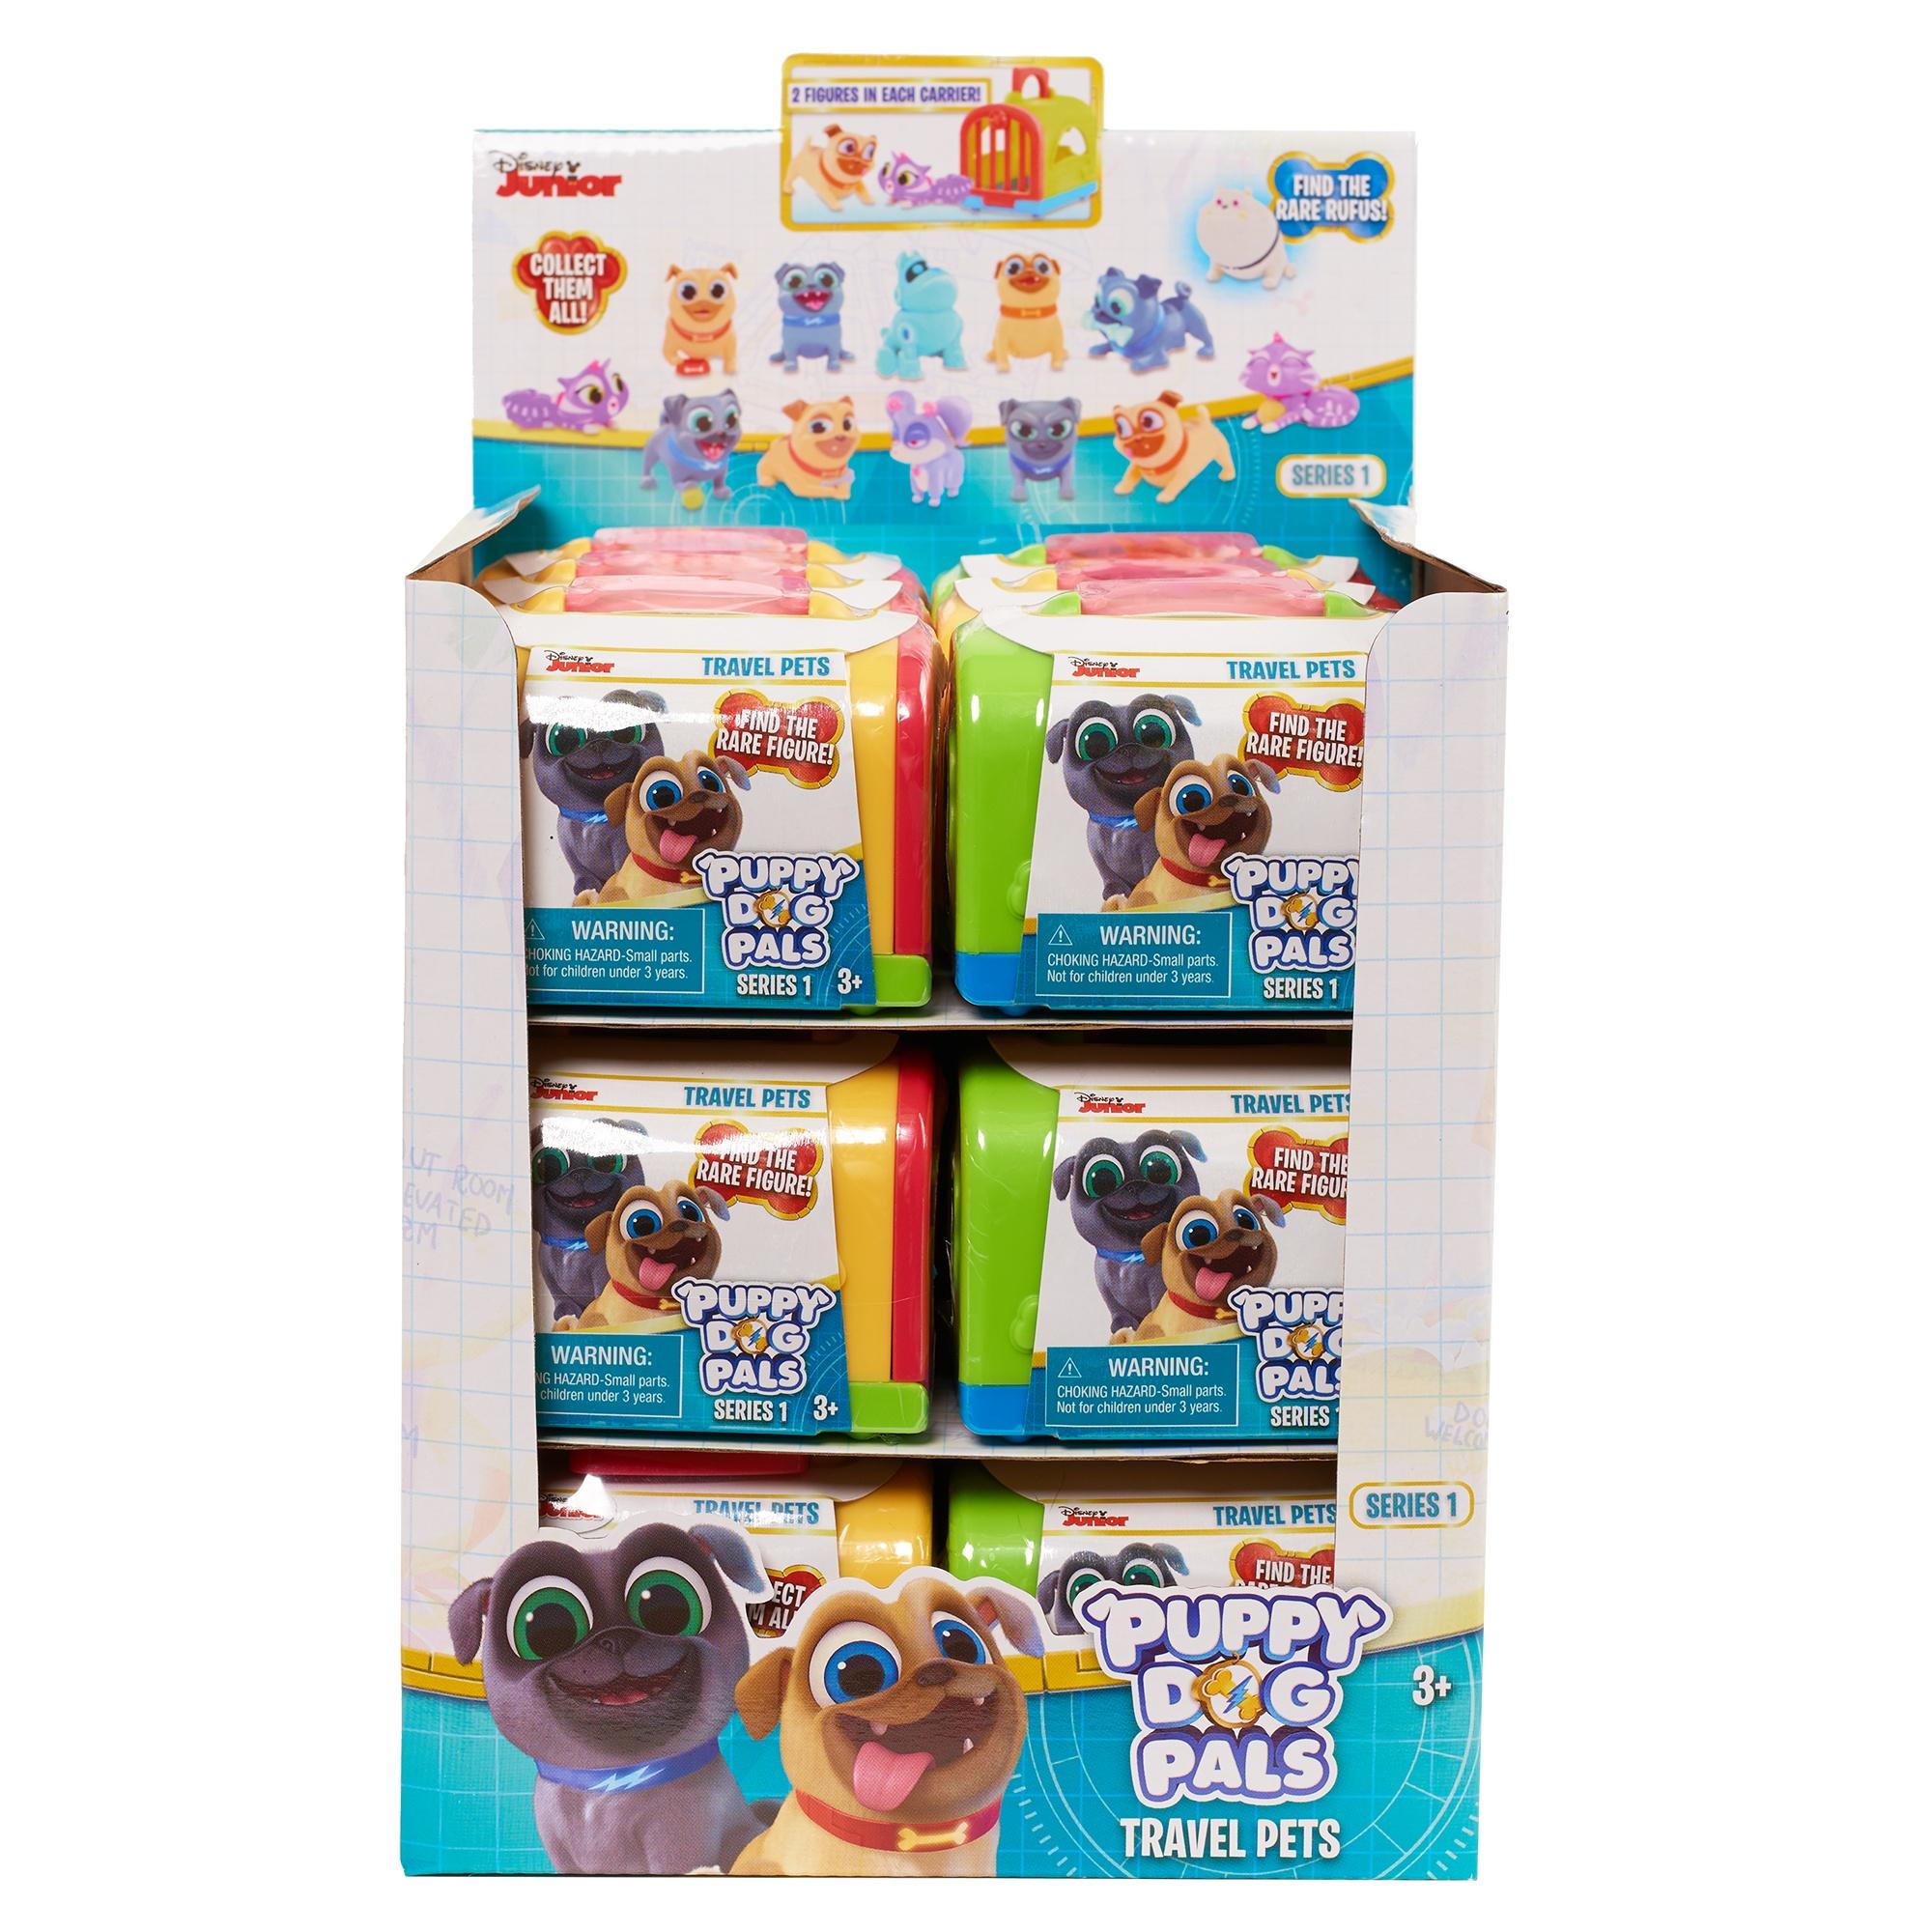 Puppy Dog Pals Travel Pets 94075 Toymate 3